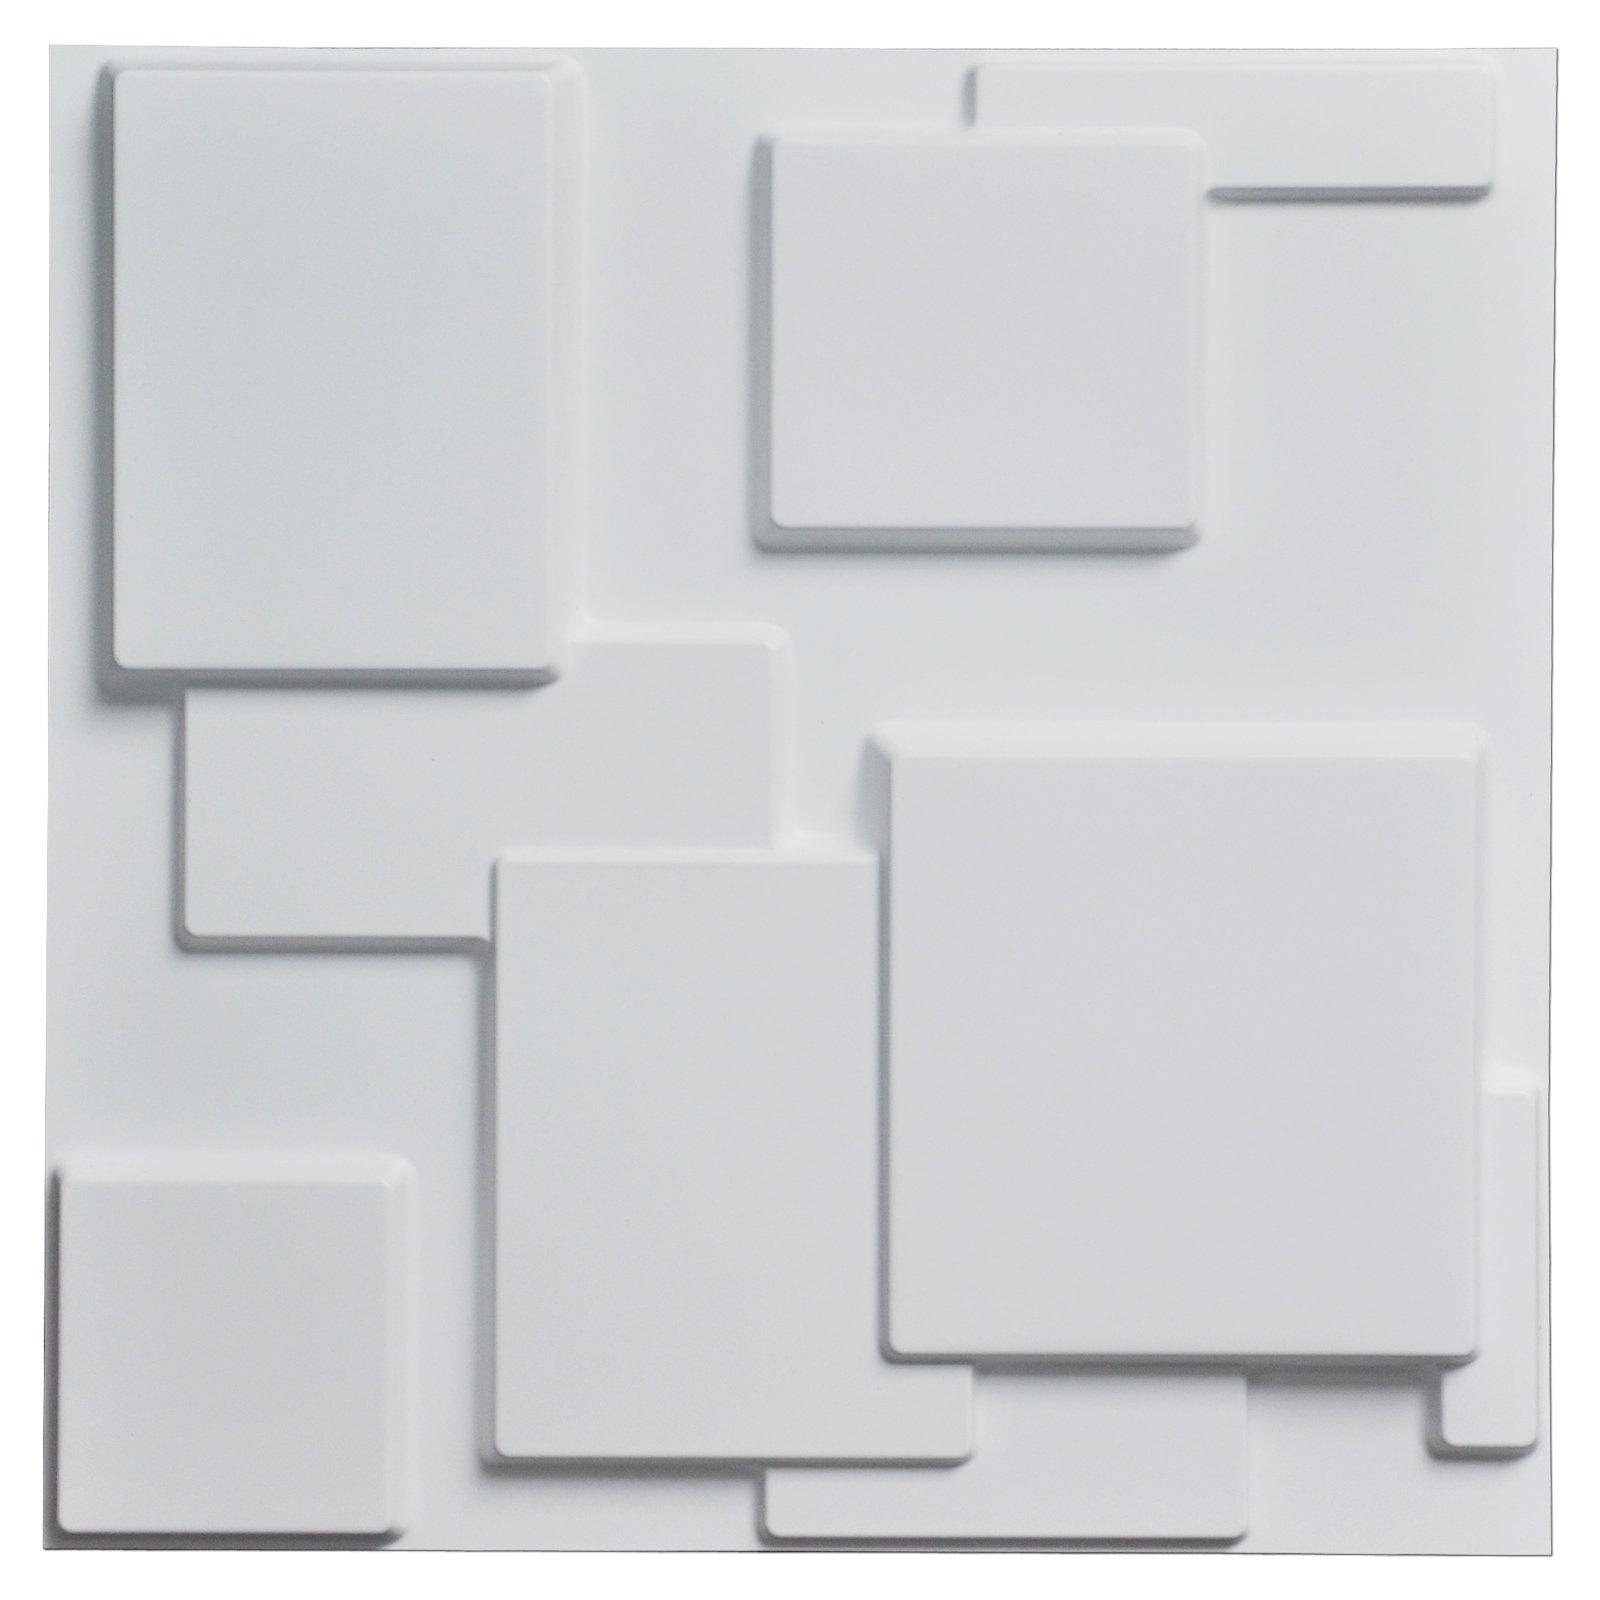 Art3d Decorative Tiles 3D Wall Panels for Modern Wall Decor White